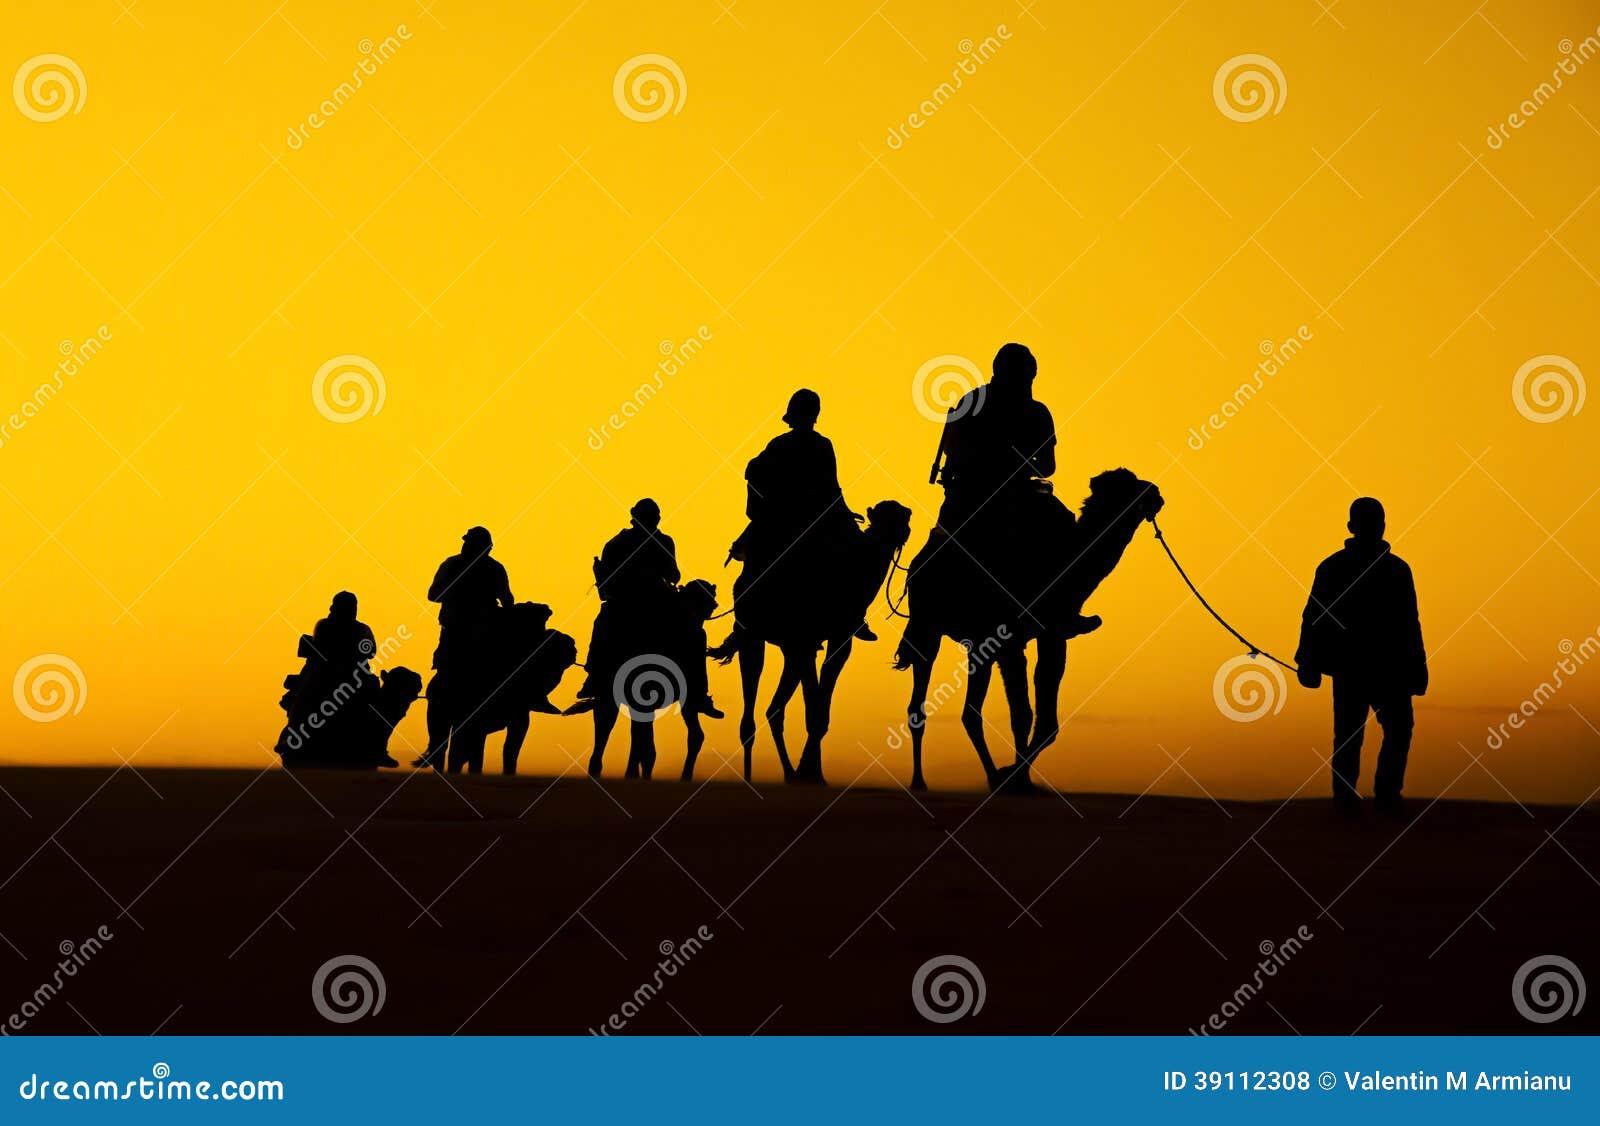 Silueta de la caravana del camello